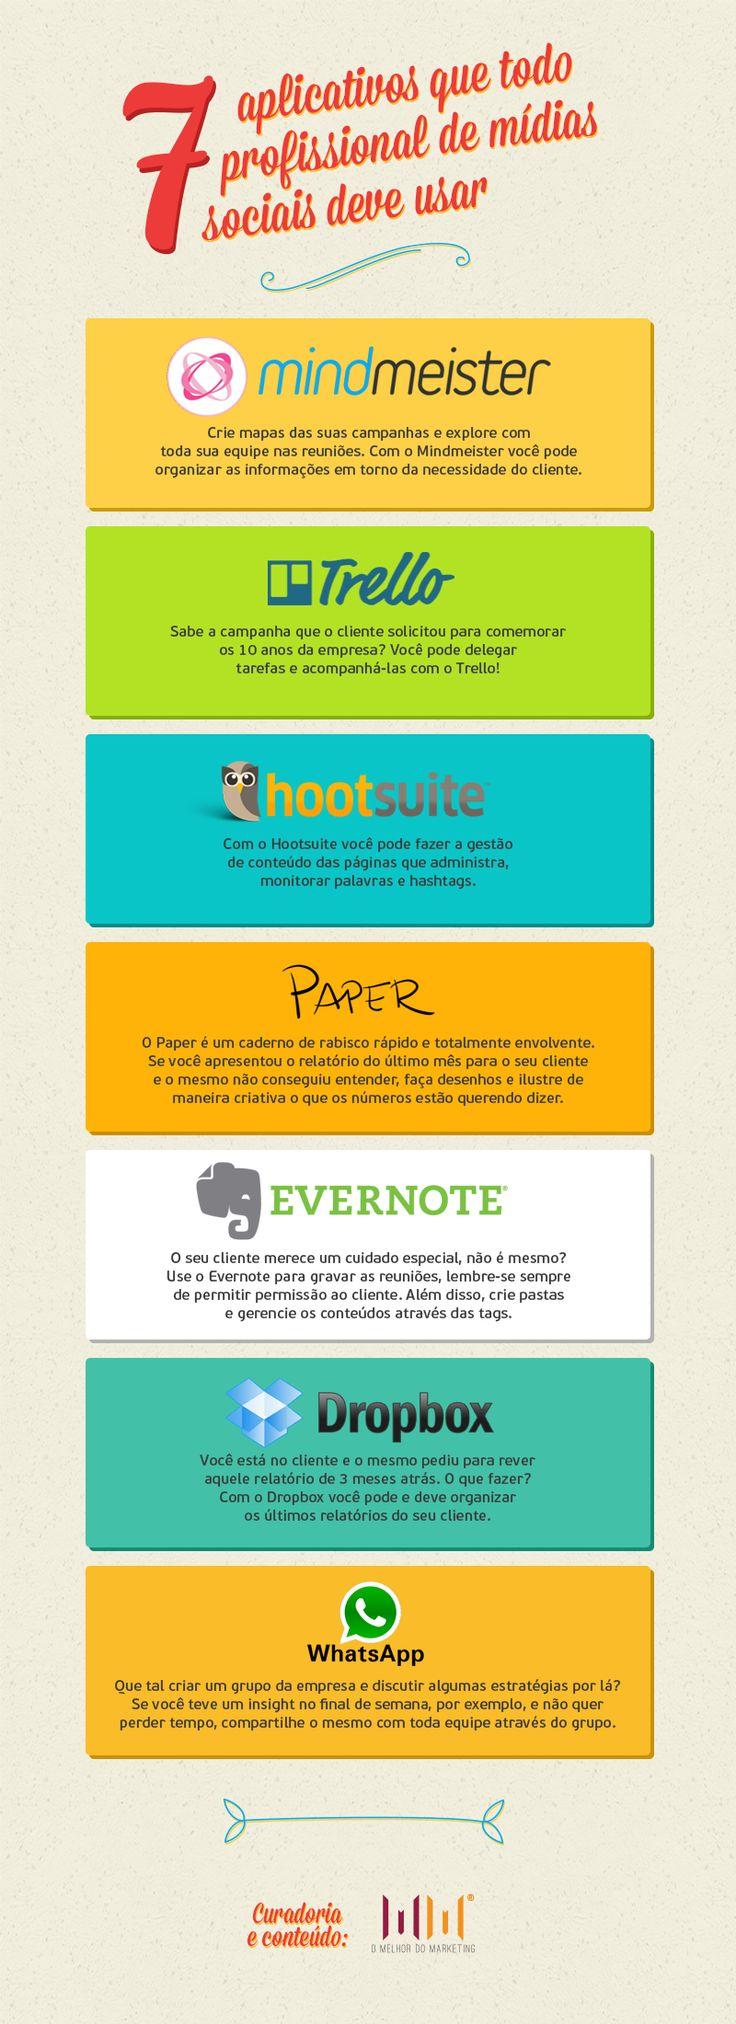 #infografico: aplicativos redes sociais #socialmedia #app